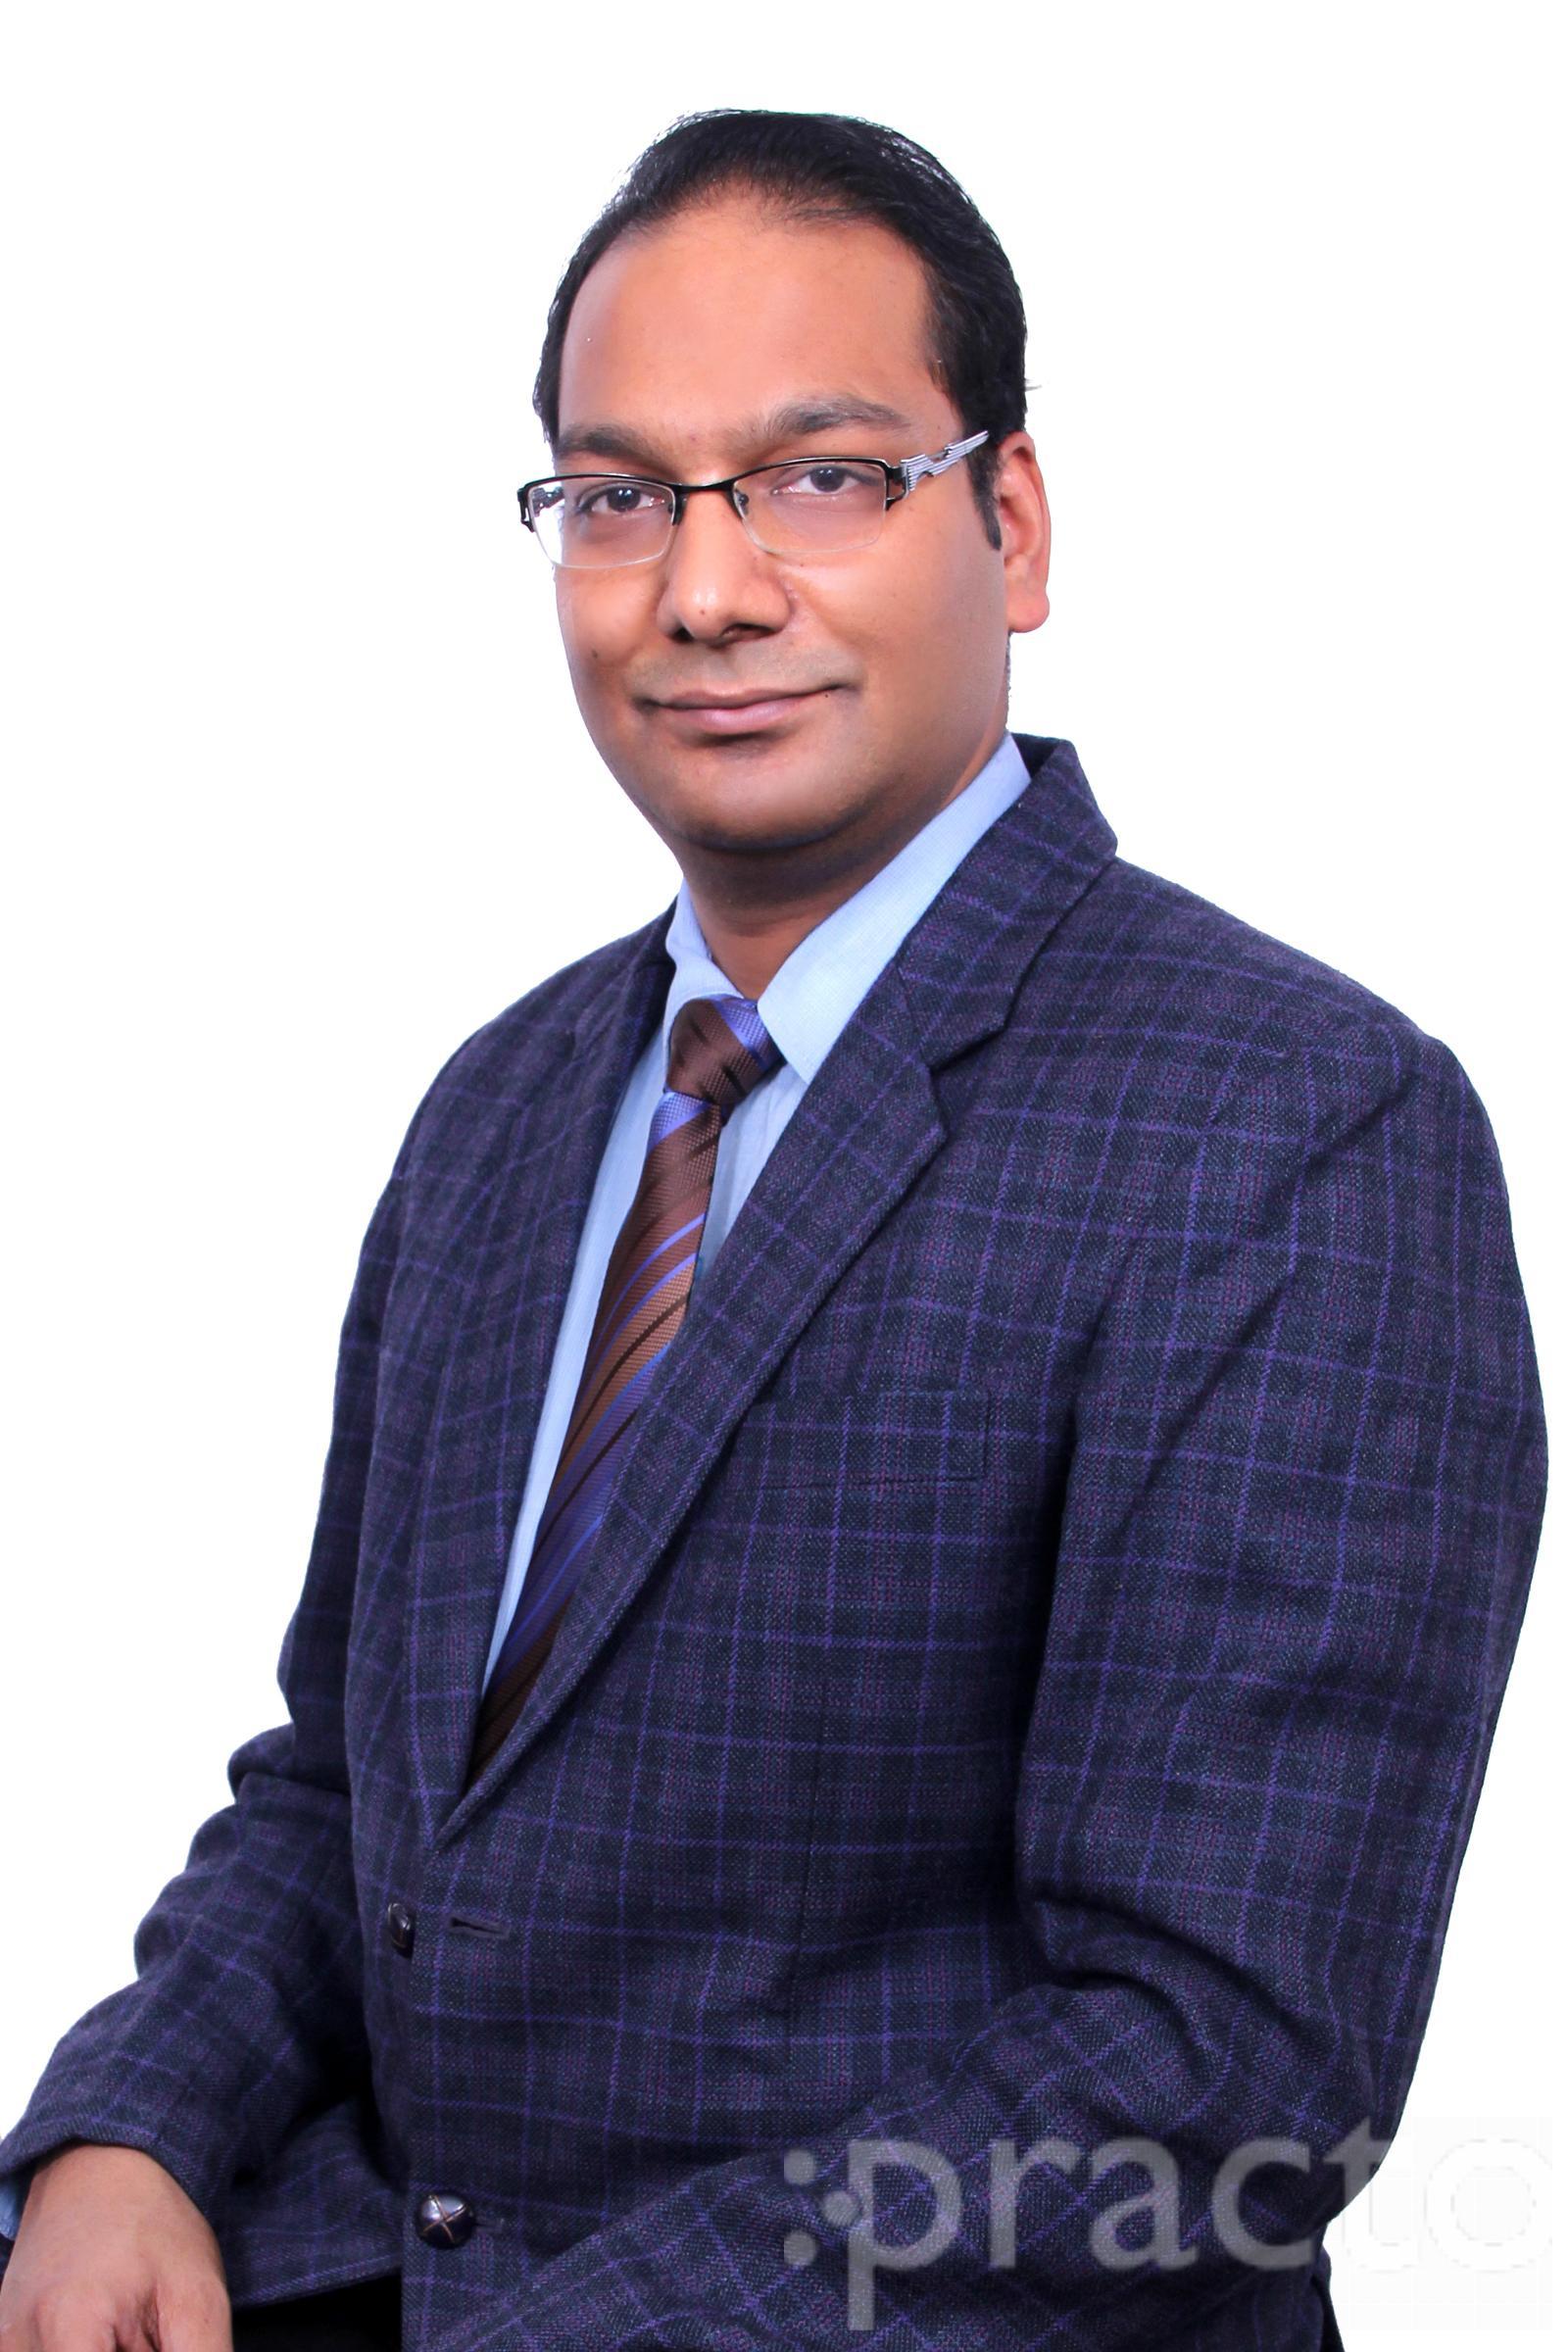 Dr. Siddharth Aggarwal - Orthopedist